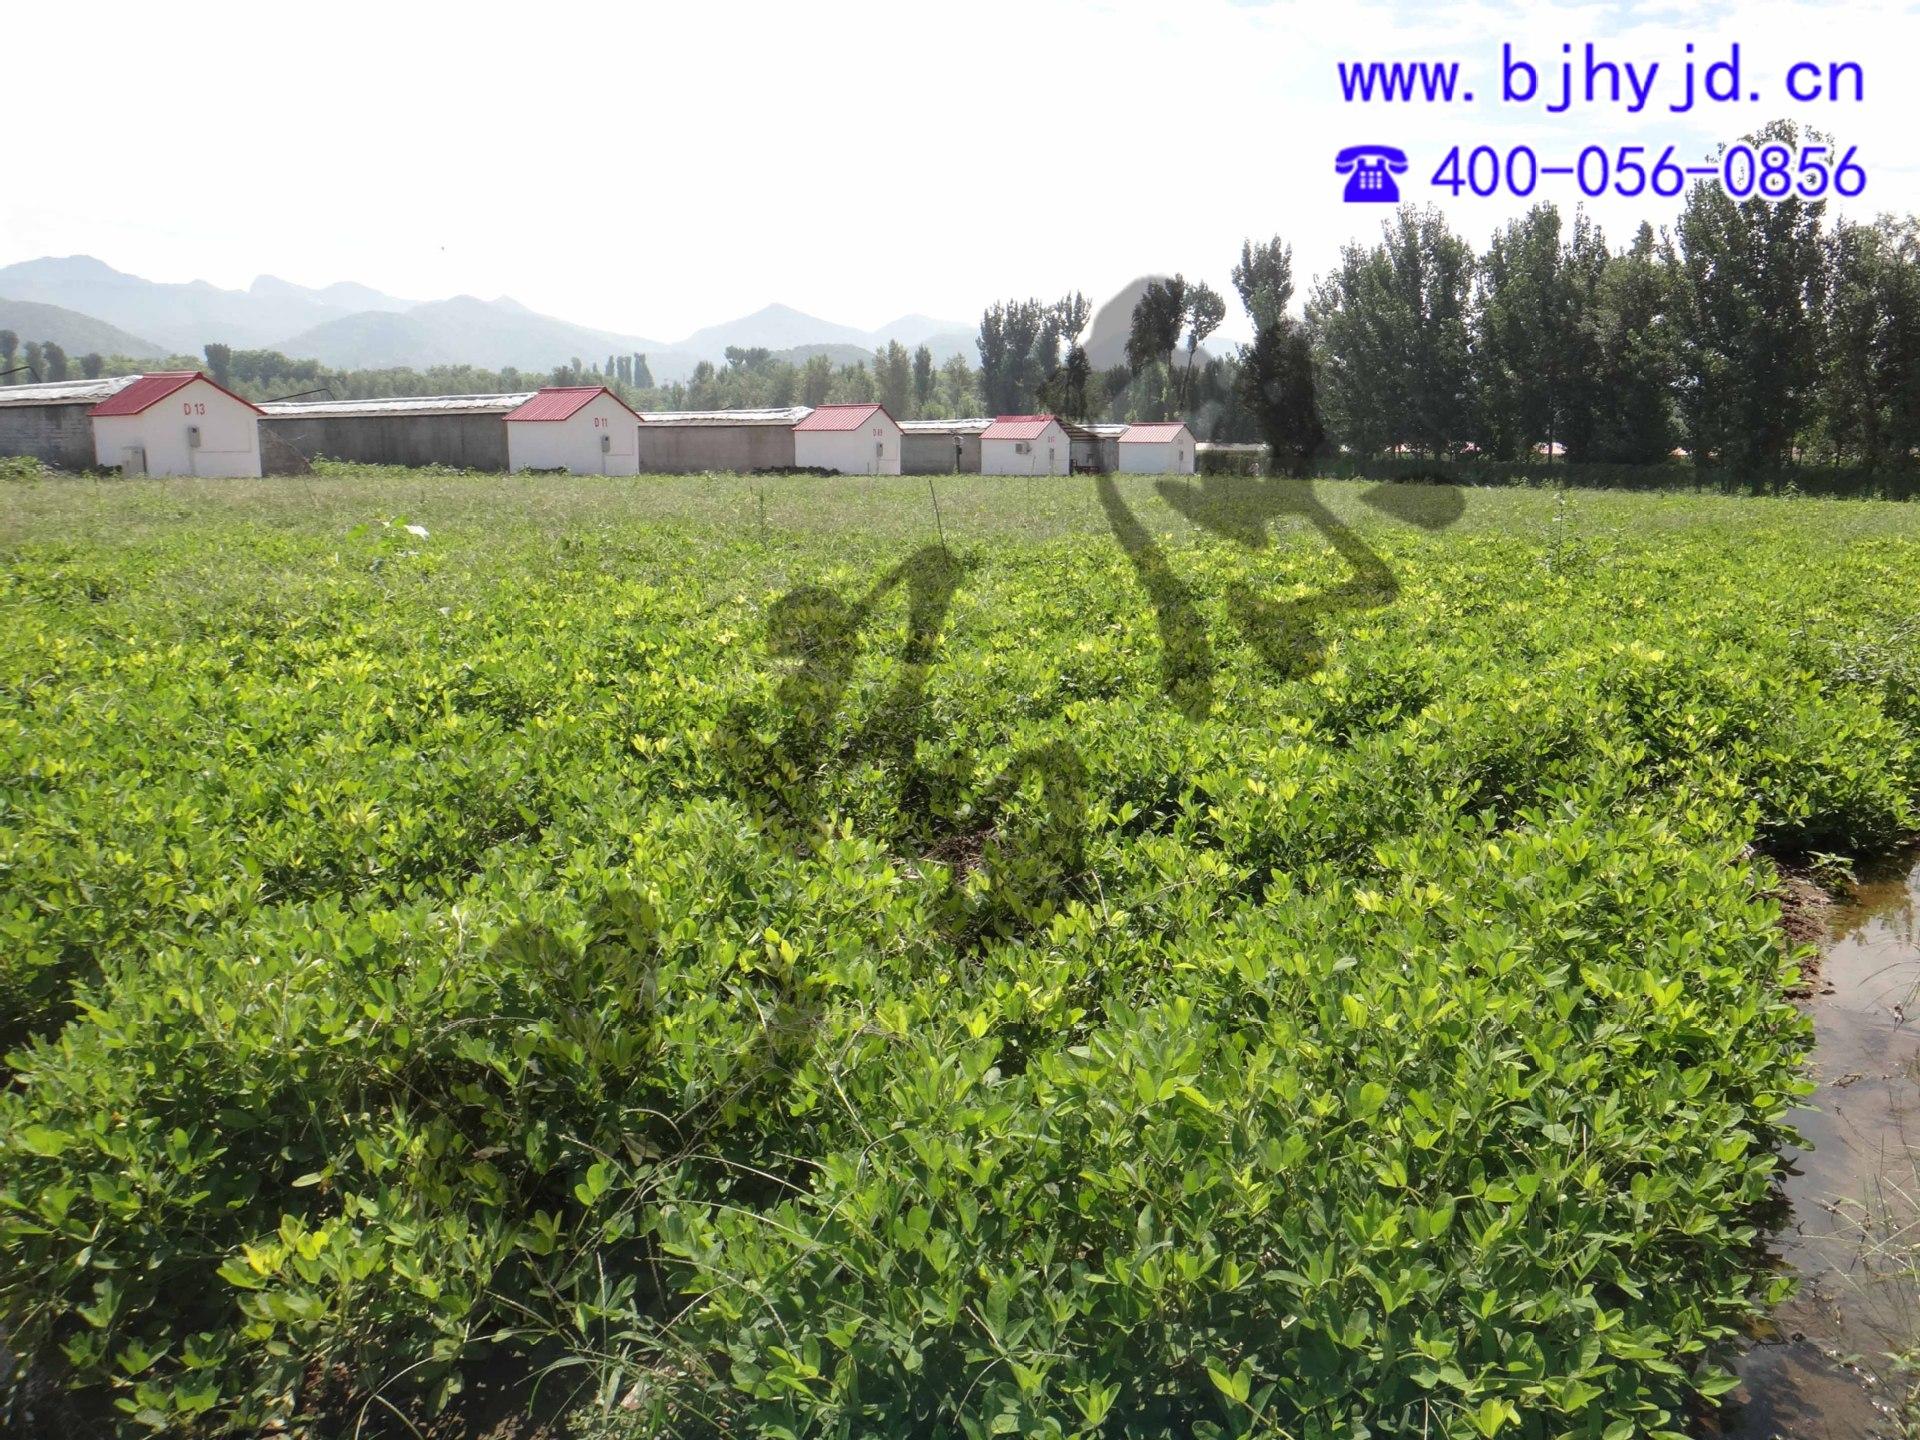 Nguyên liệu sản xuất phân bón Peanut fertilizer organic and inorganic fertilizer top dressing (full